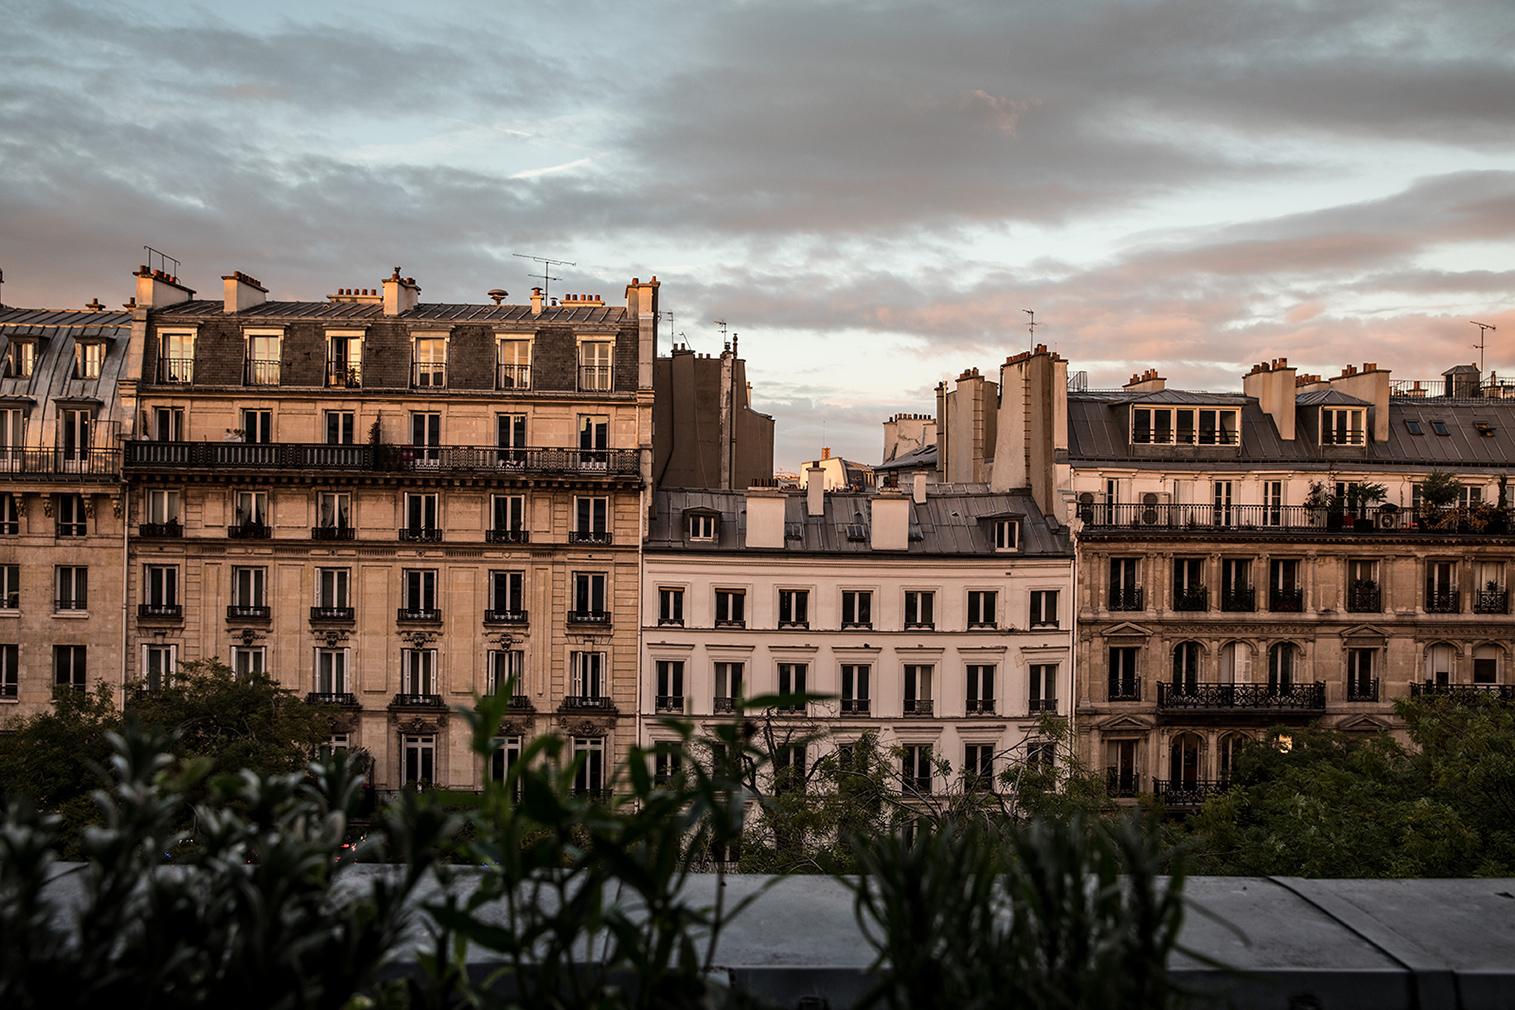 Paris' Hotel des Grands Boulevards channels the French Revolutionary spirit